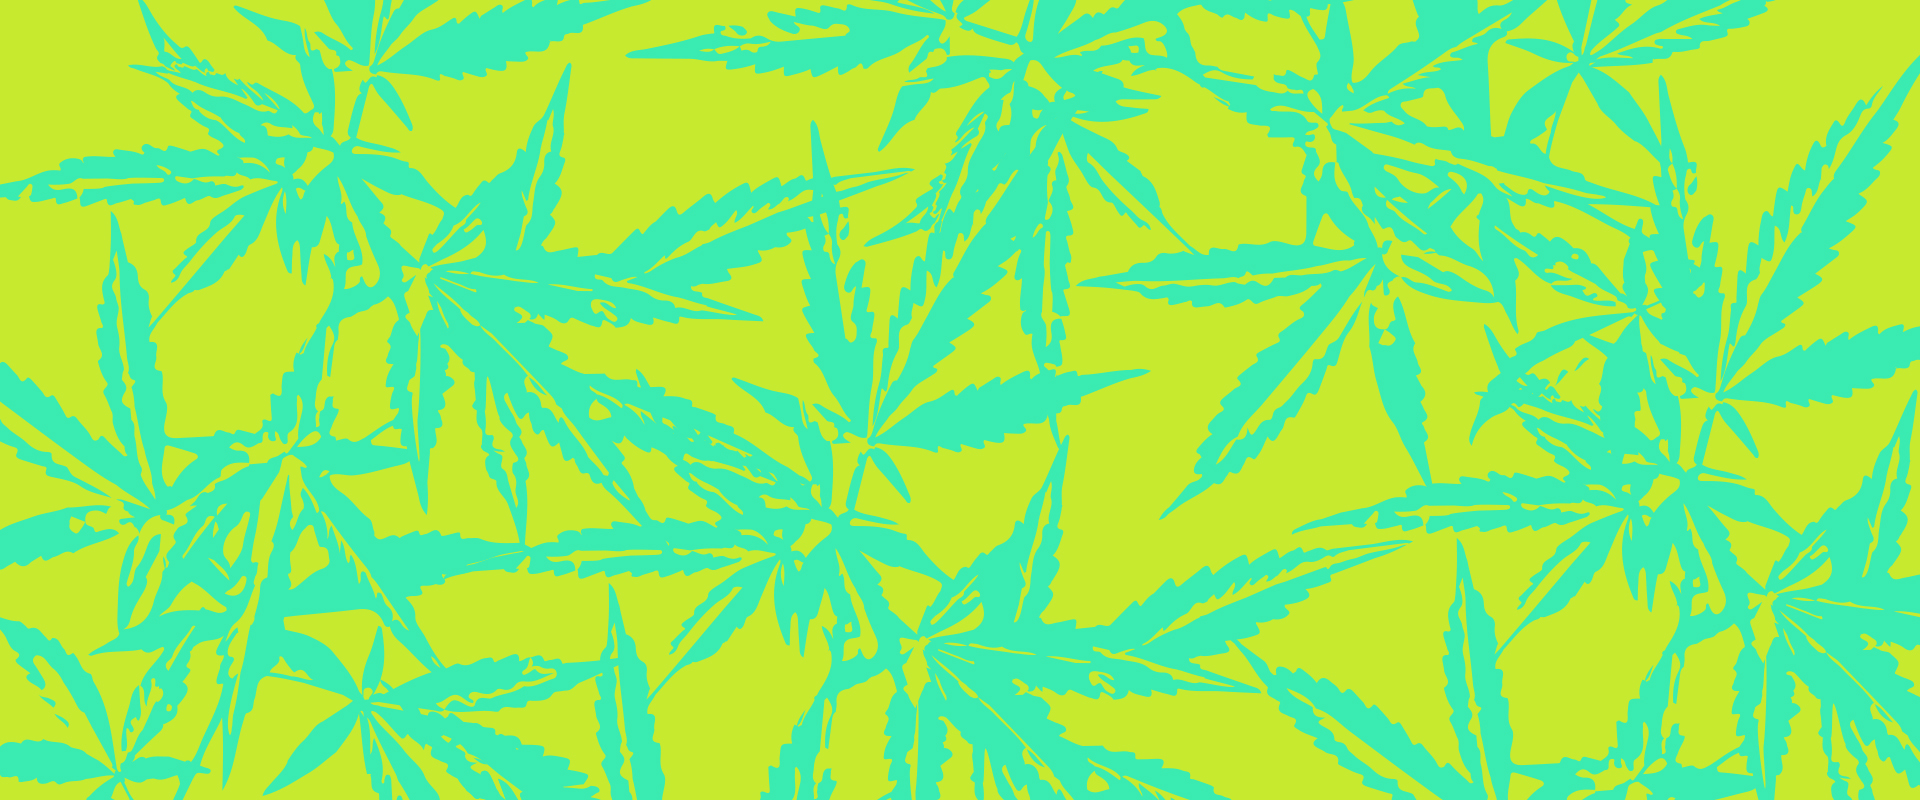 Ten17 Digital Cannabis Co launches on 4/20.